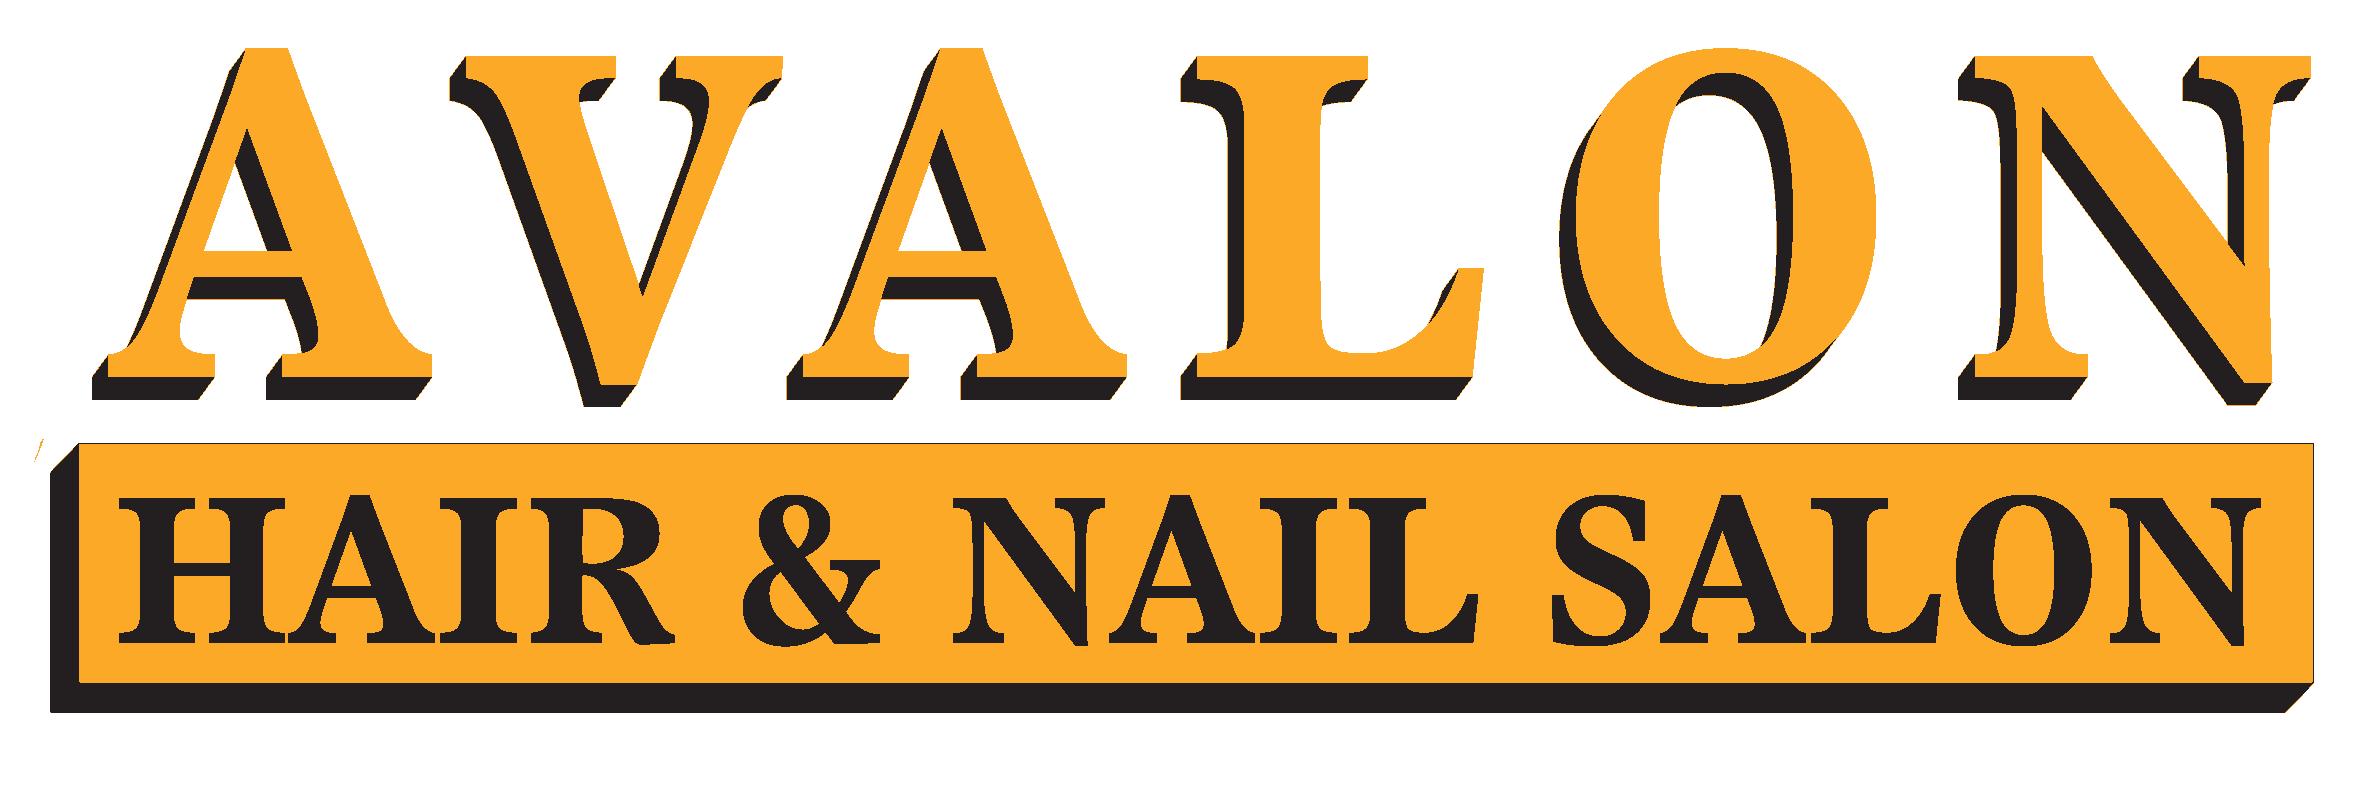 Coupon clipart hair salon. Avalon nail